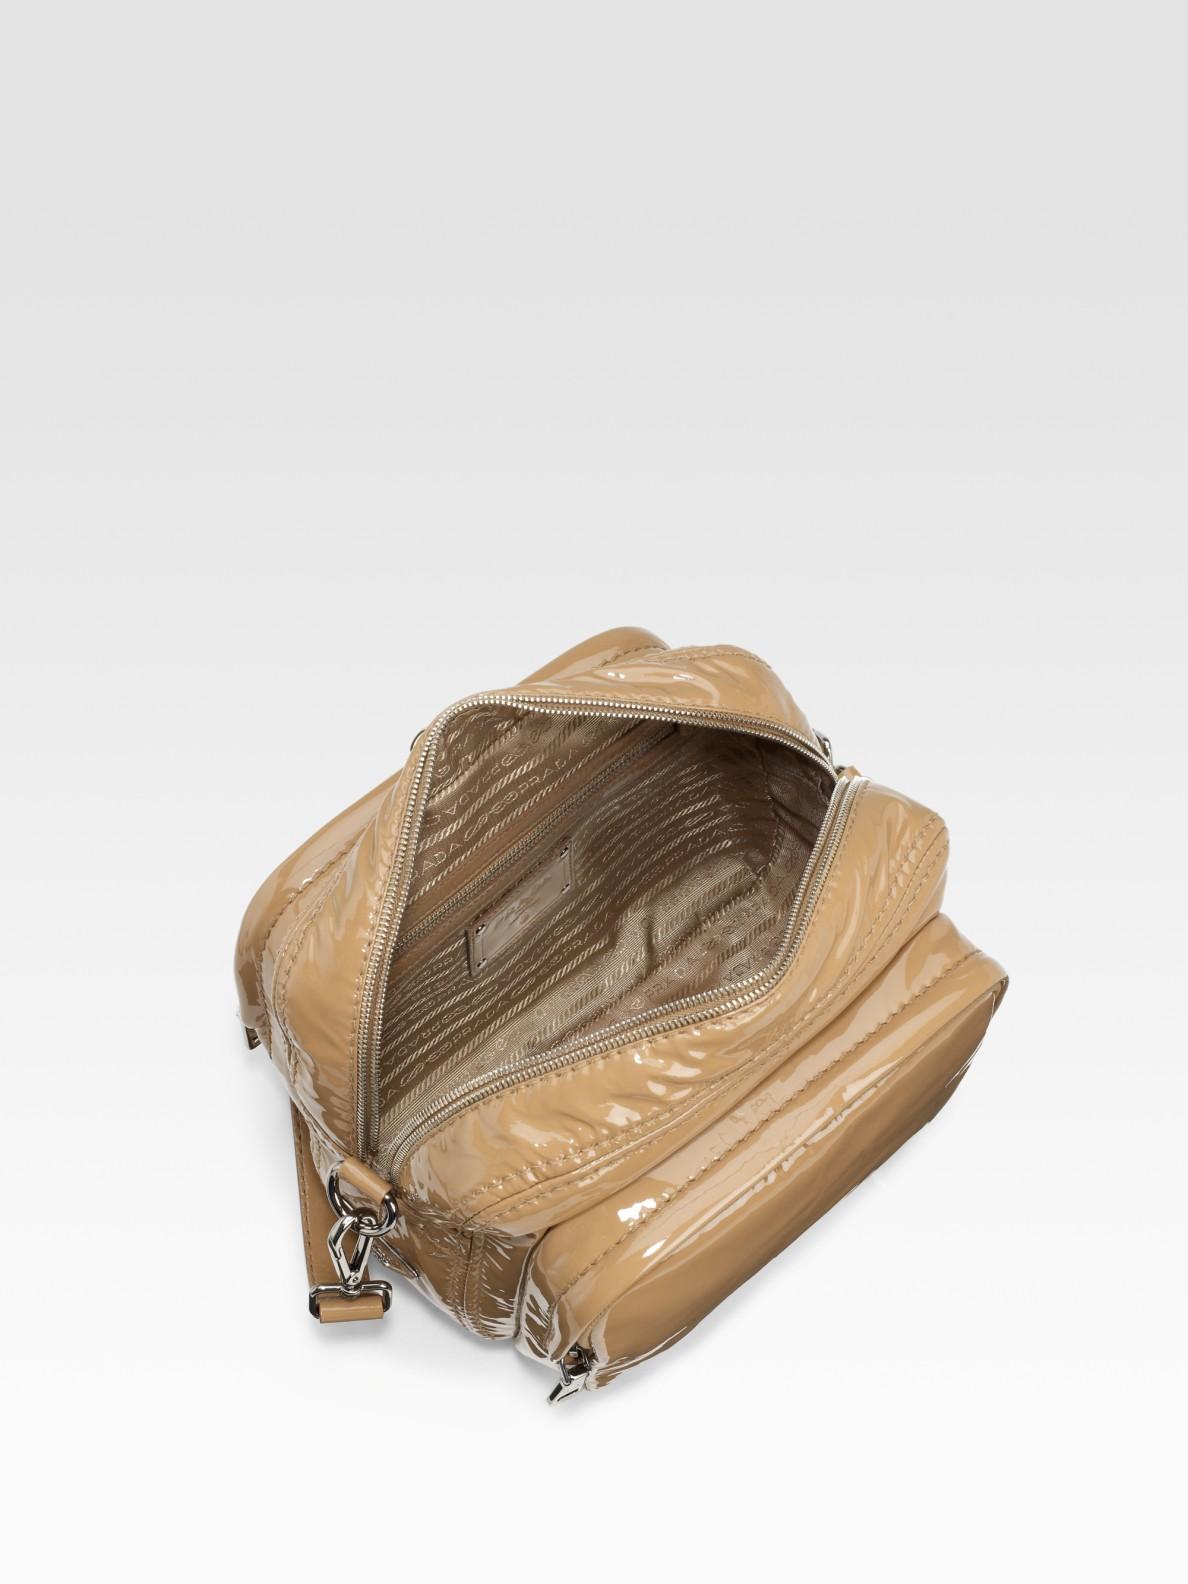 Prada Vernice Patent Leather Camera Bag in Beige (camel) | Lyst